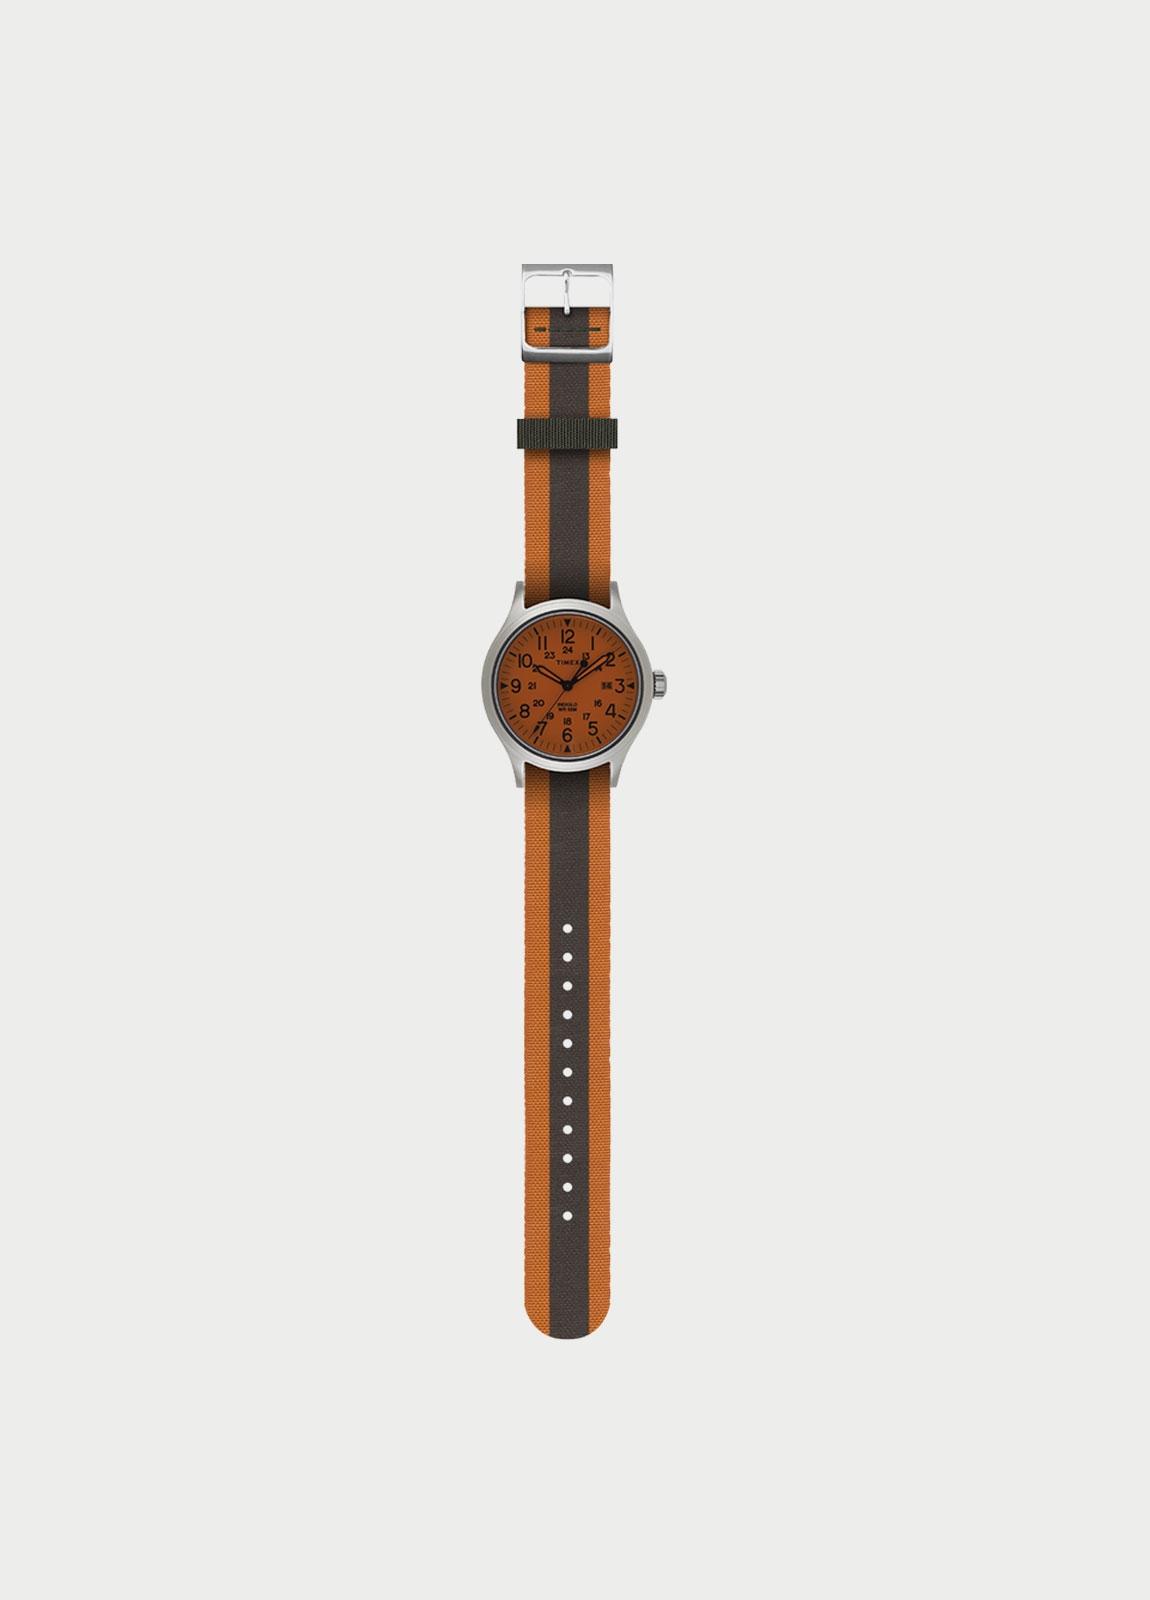 Correa Reloj TIMEX reversible naranja/ kaki (la caja reloj se vende por separado)